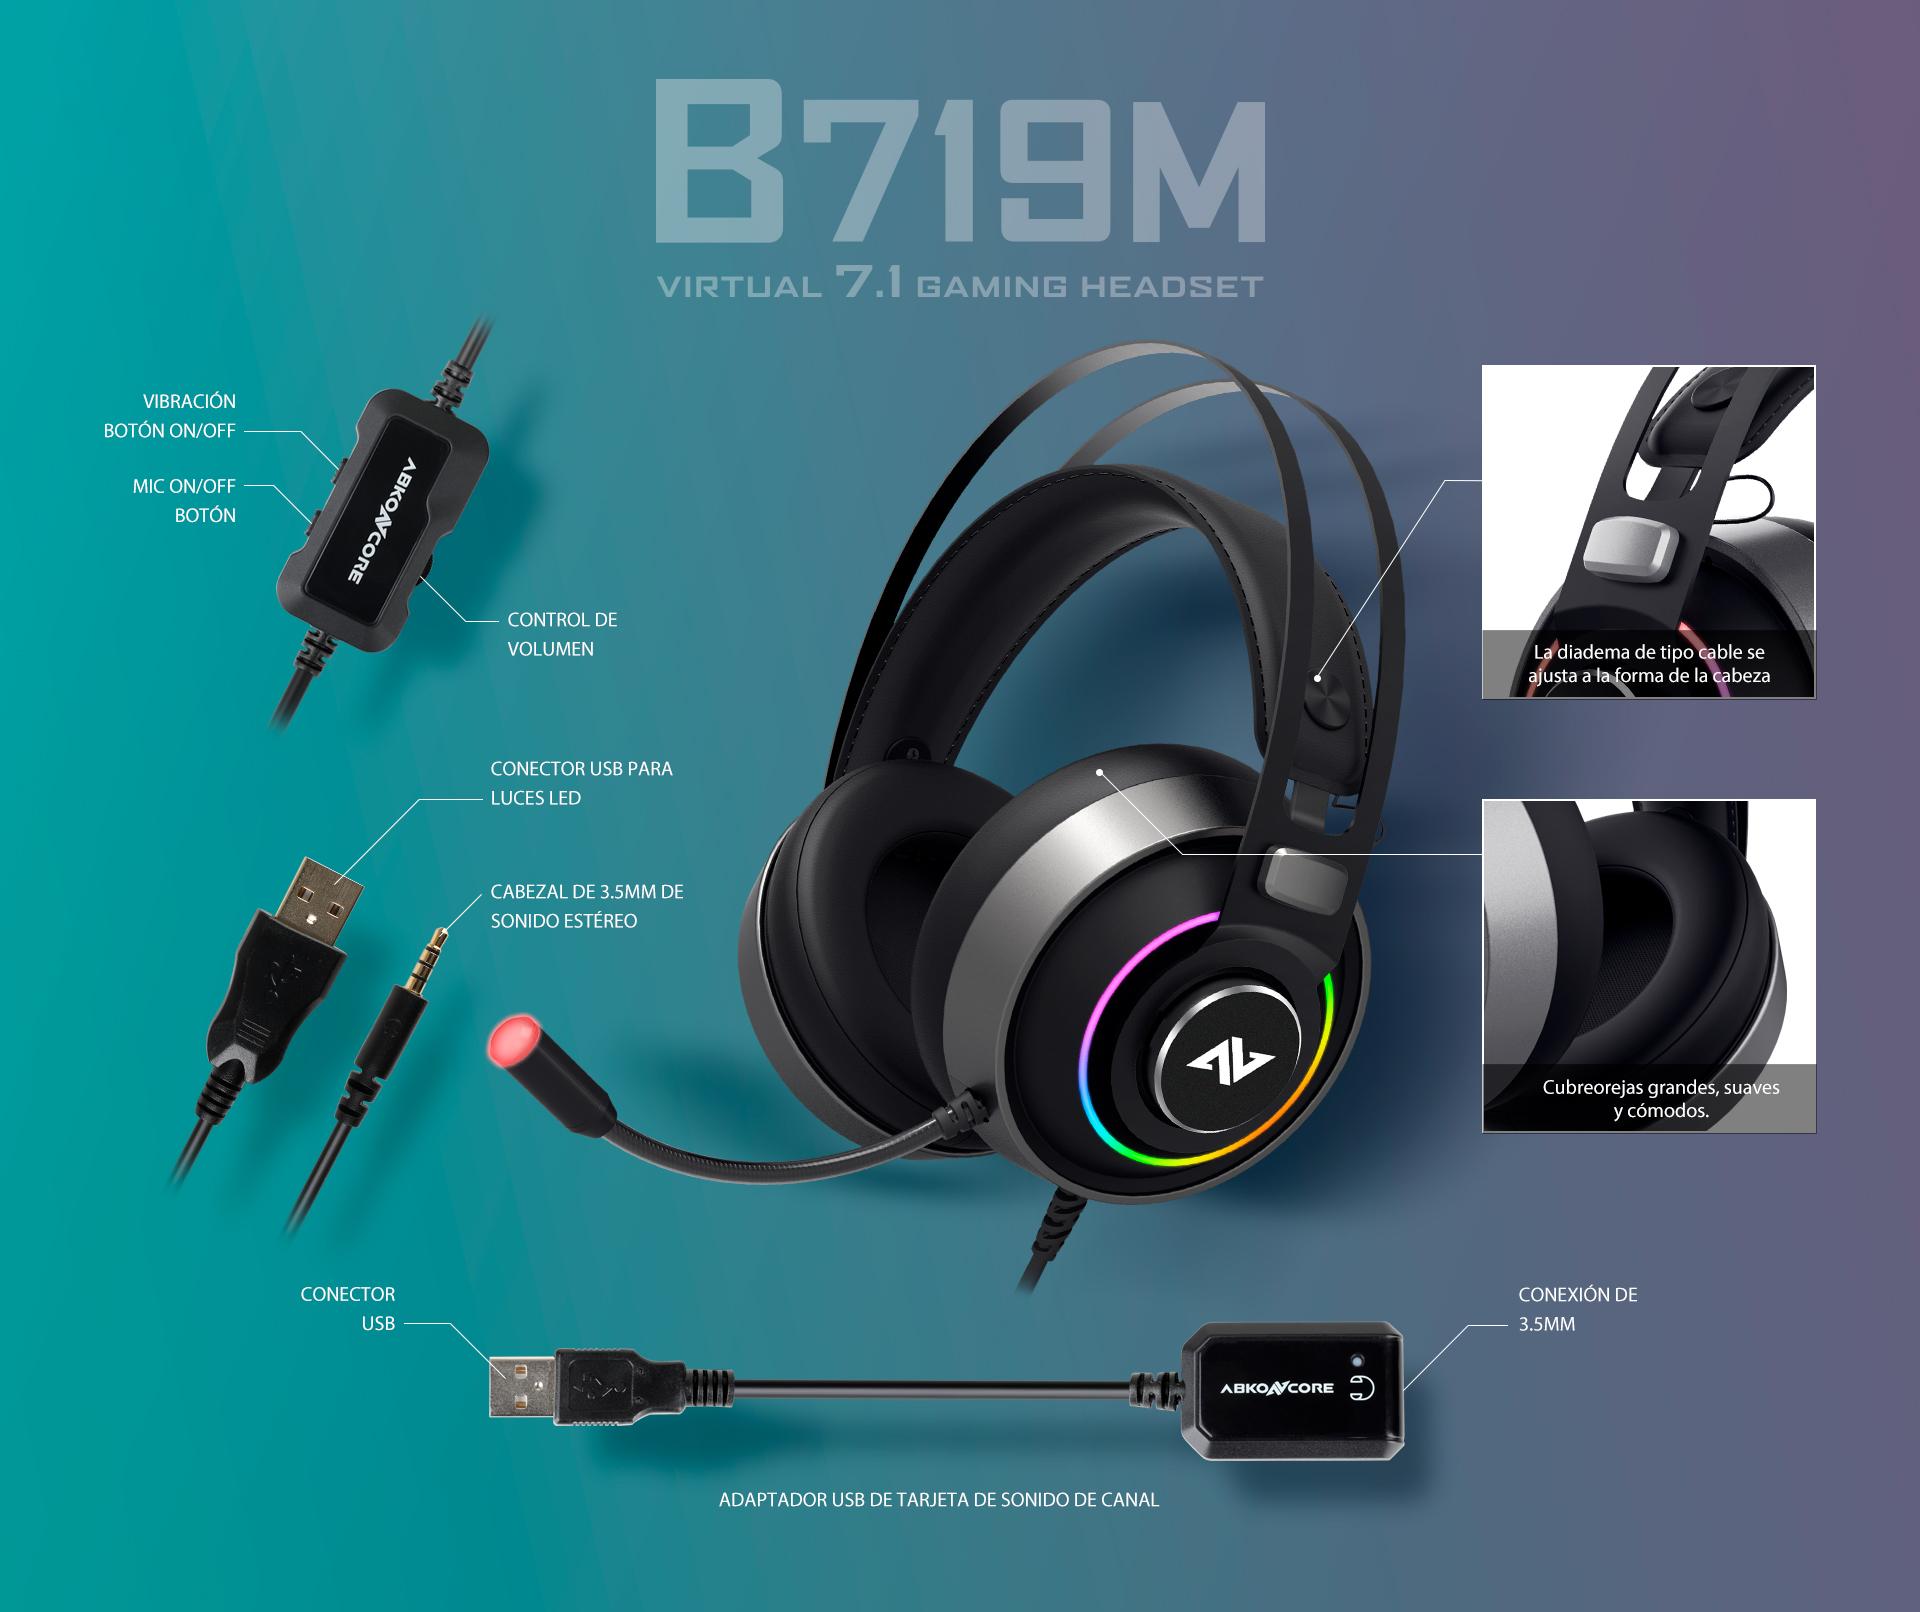 Auriculares B719M 7.1 Virtual imagen descripción